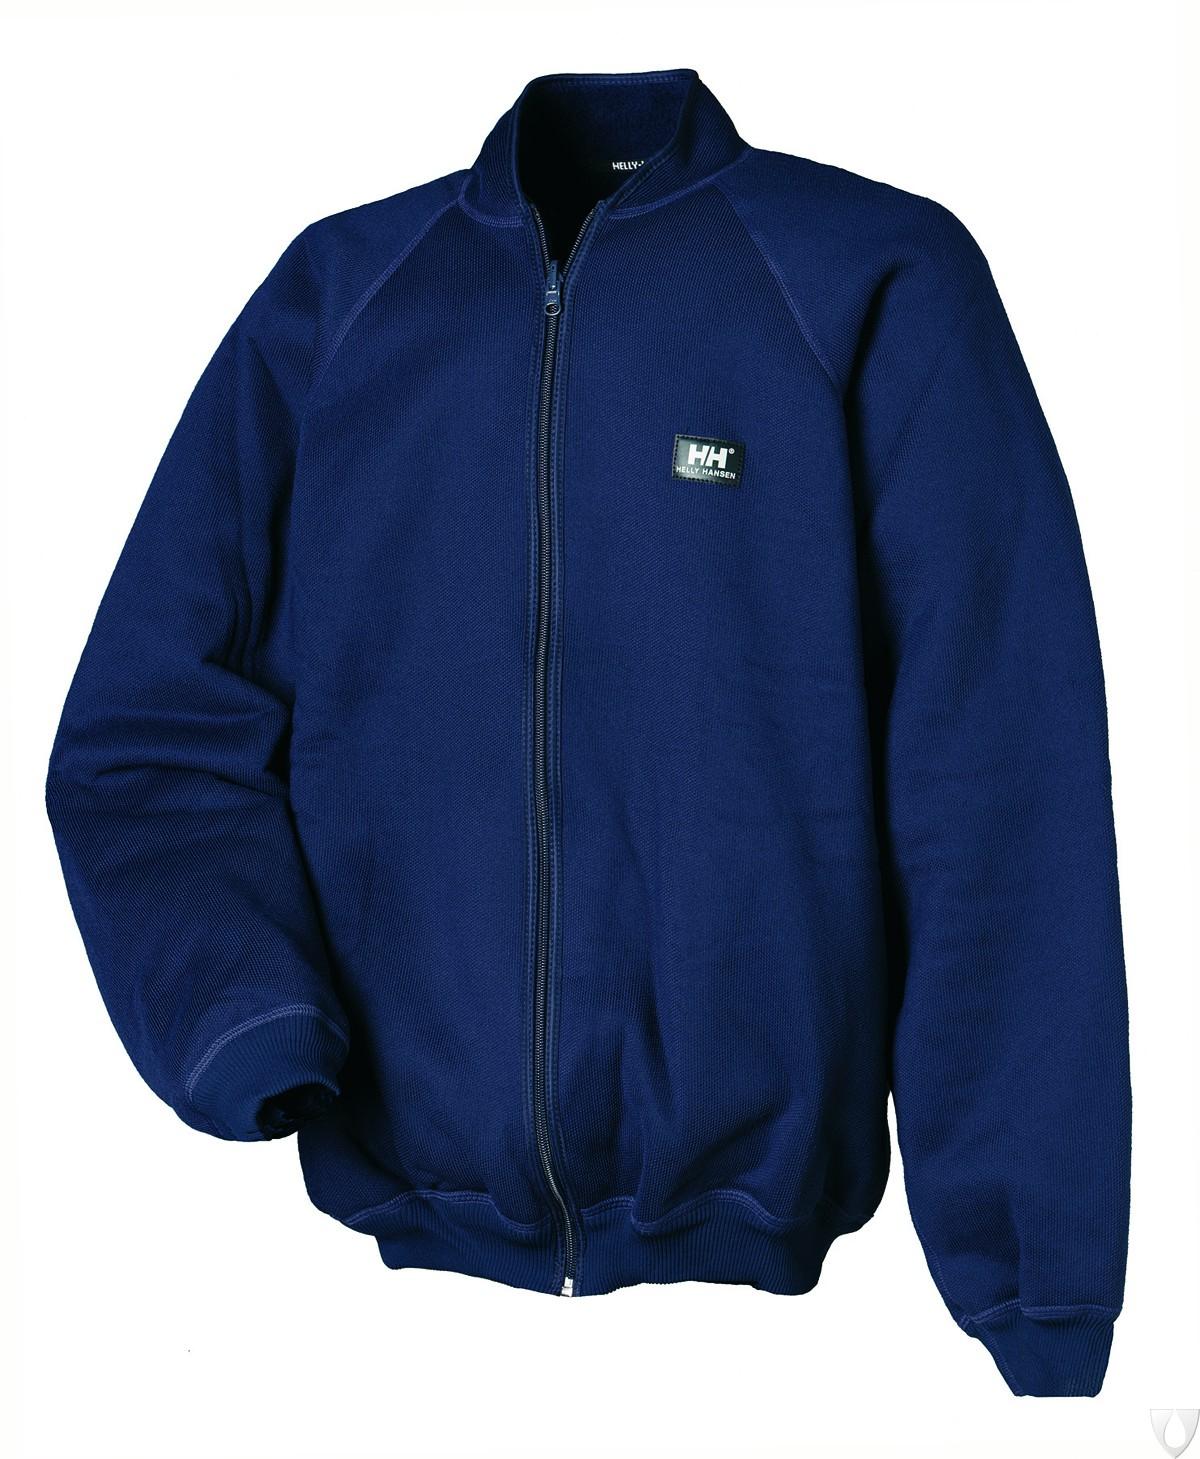 Helly Hansen Zürich Reversible Jacket 72359